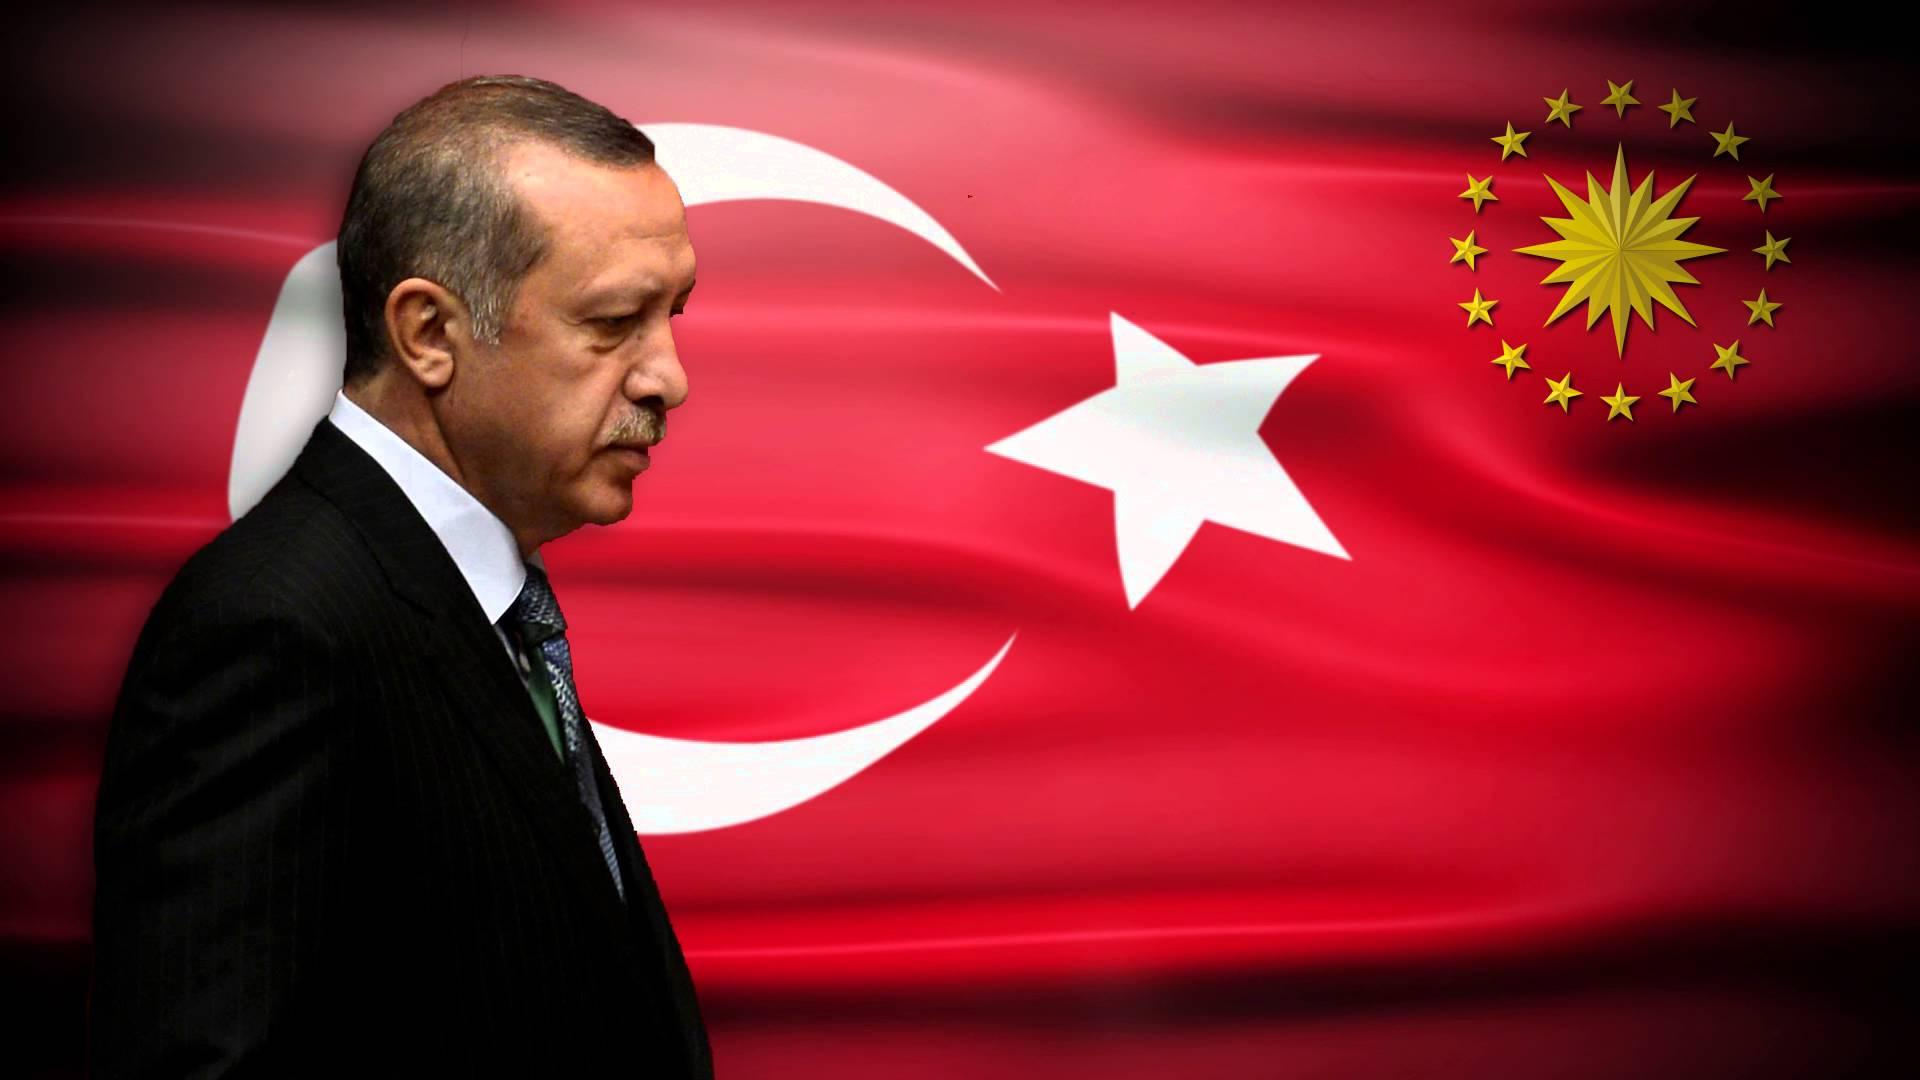 Recep Tayyip Erdoğan Wallpapers - Wallpaper